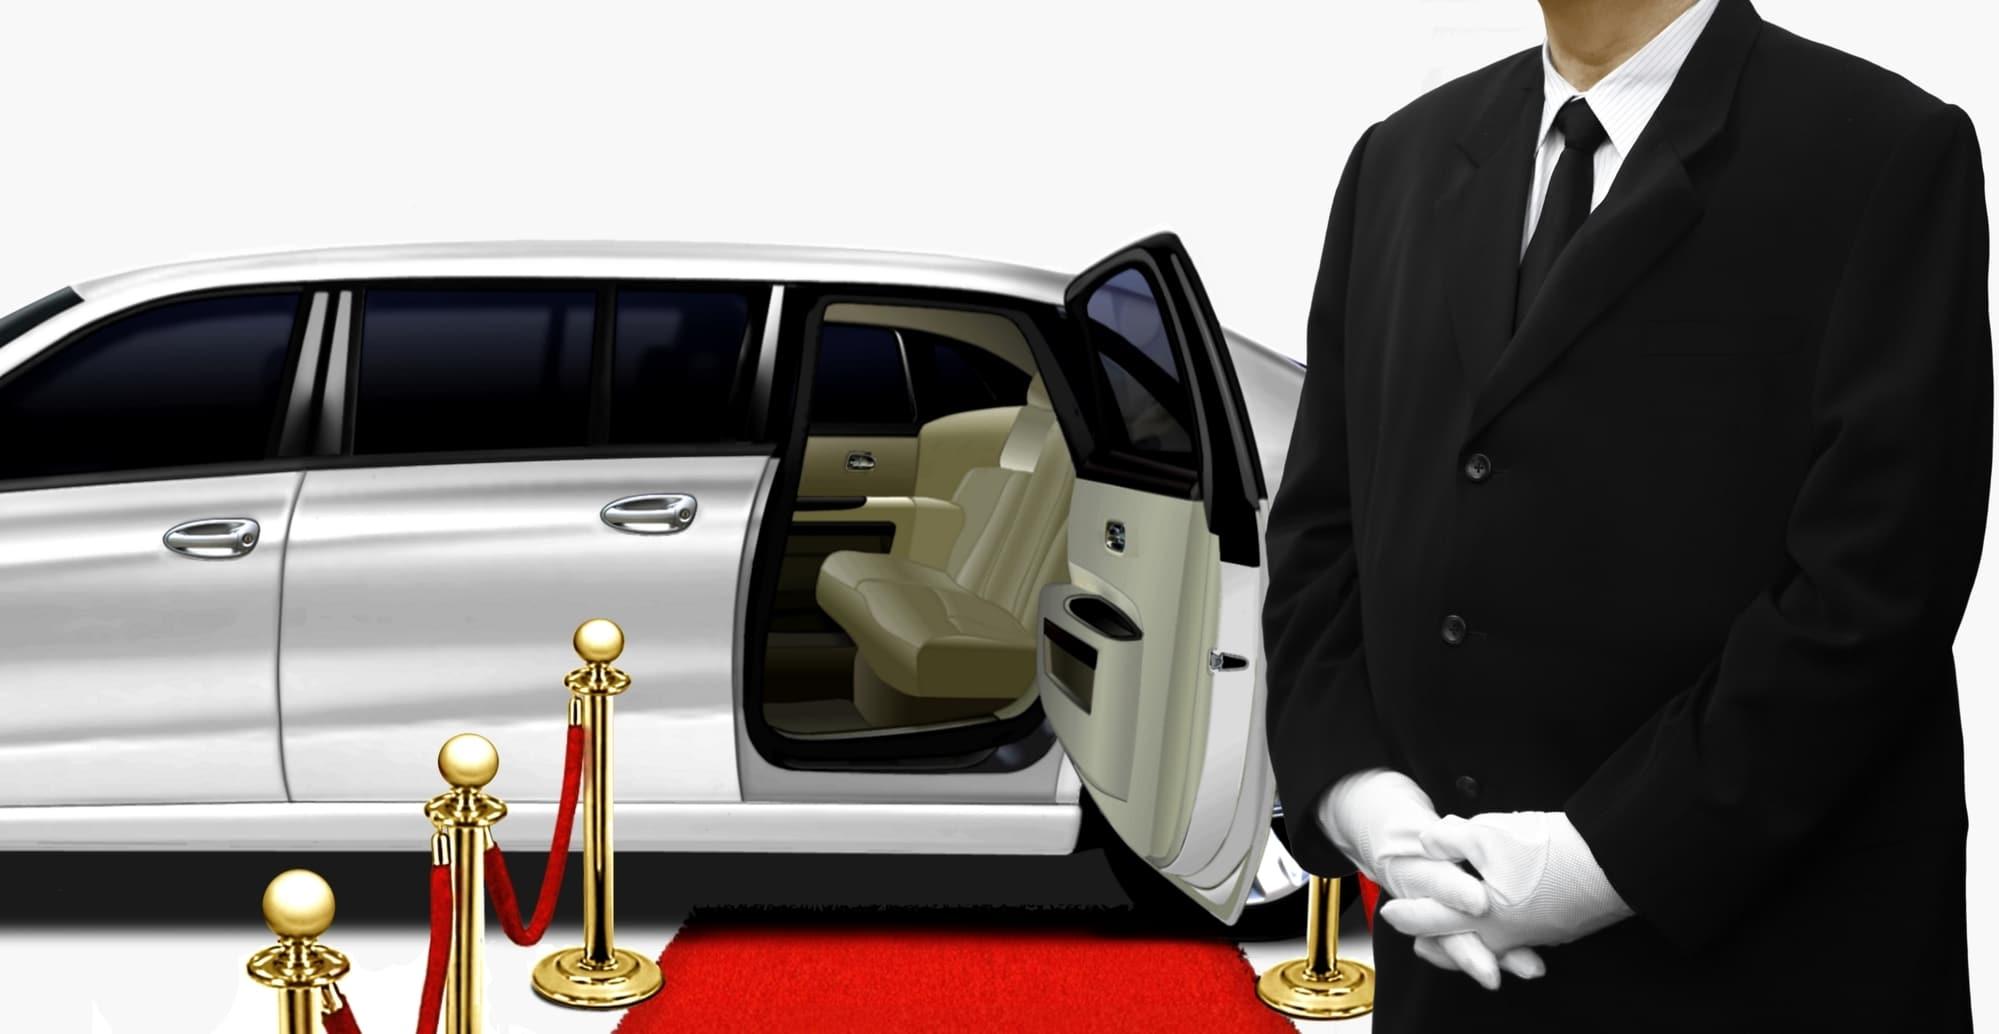 How To Setup Limousine Rental Business in Dubai